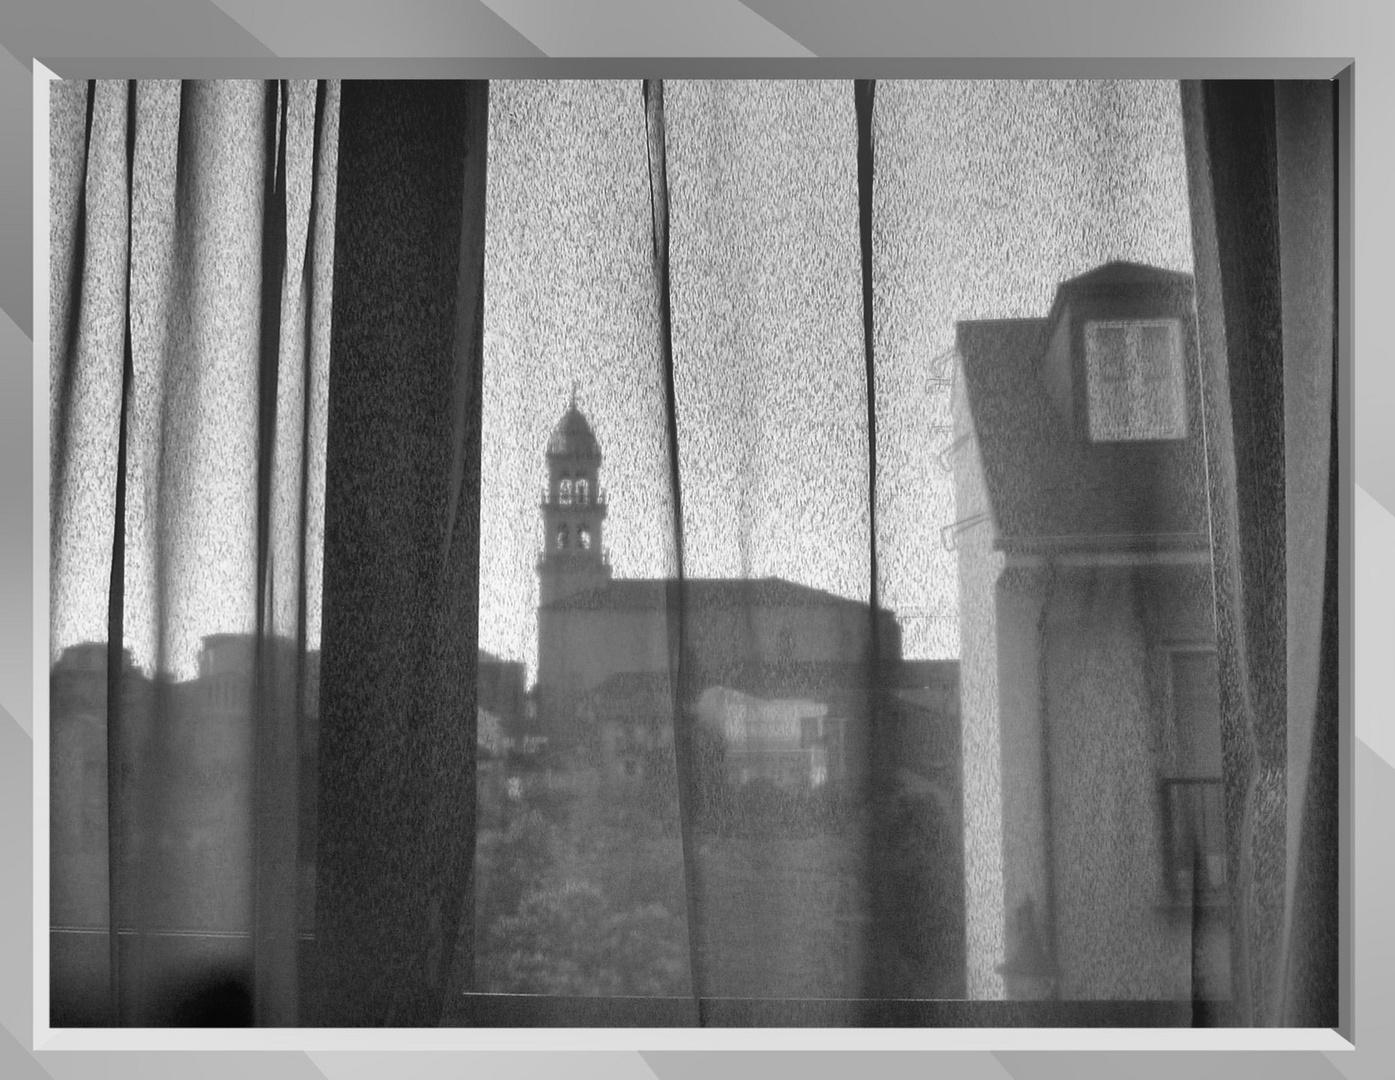 Vista por la ventana